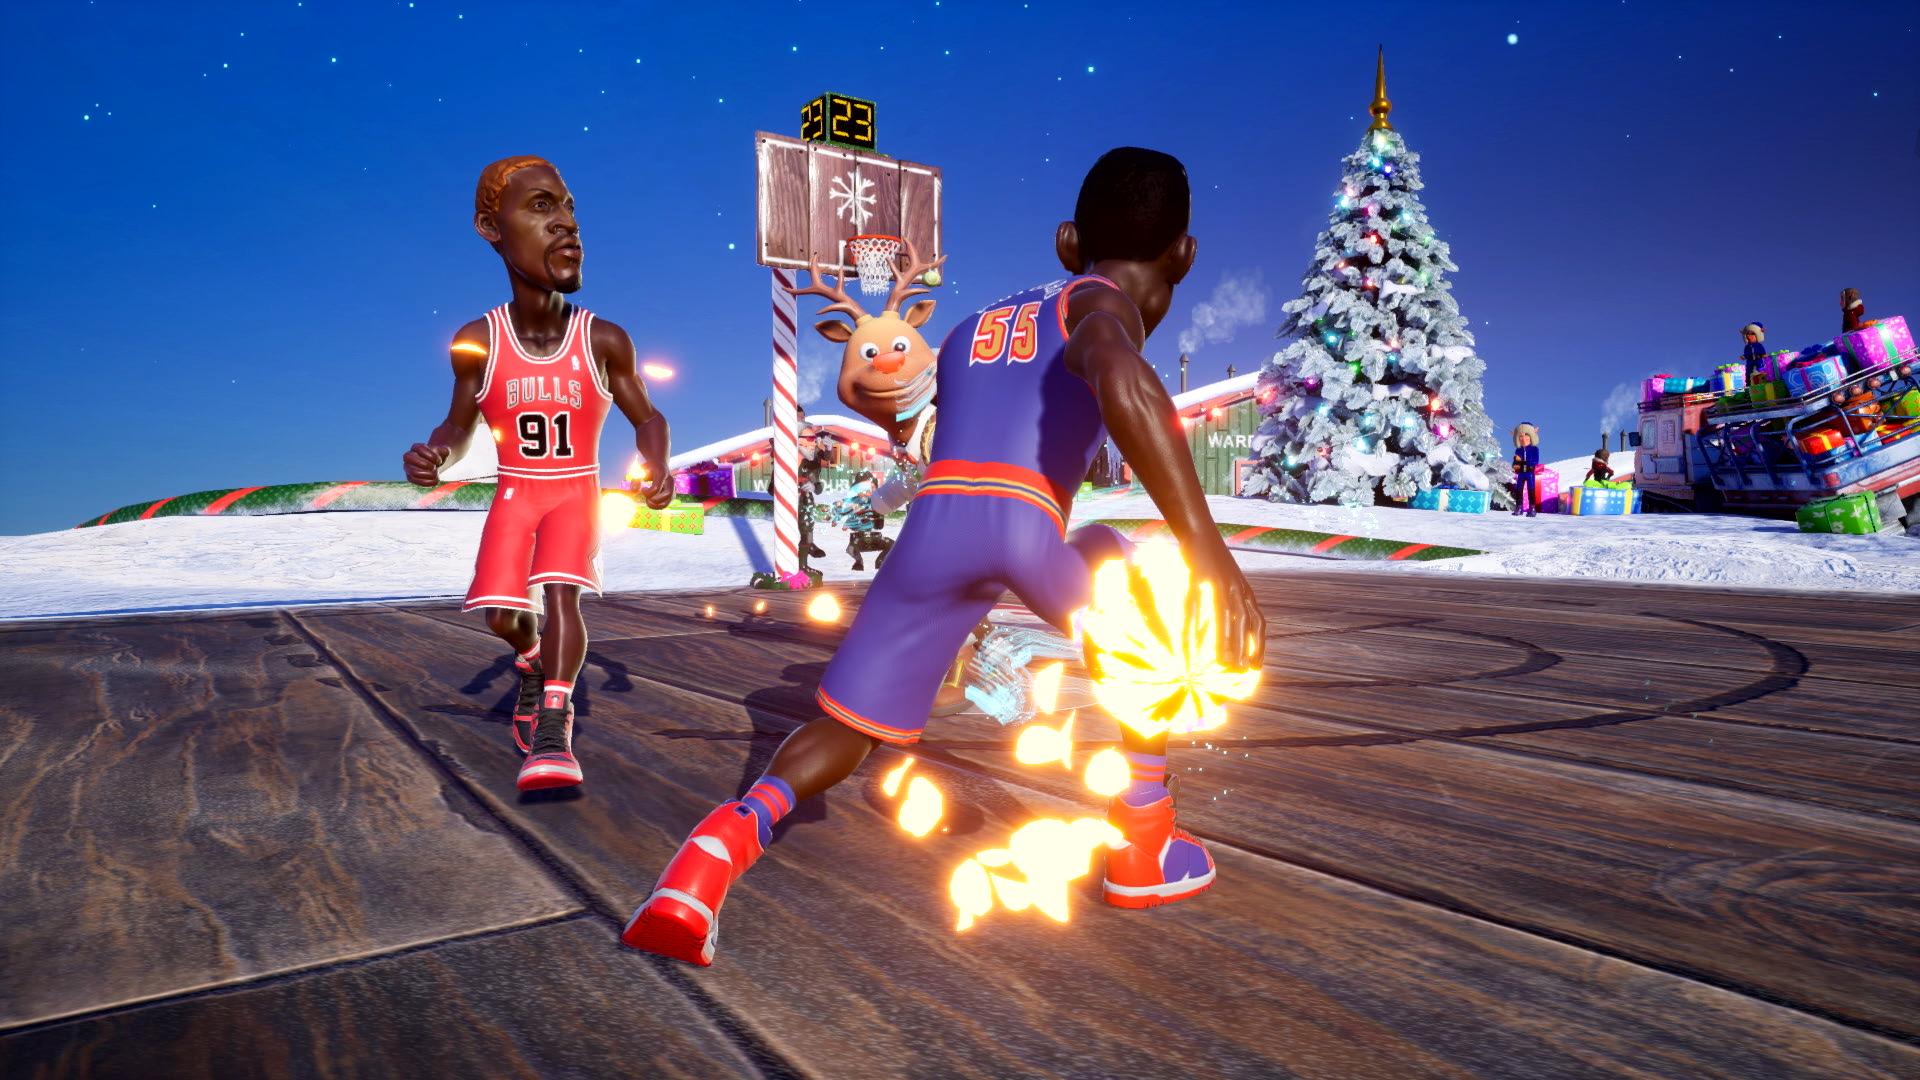 Xbox One NBA 2K Playgrounds 2